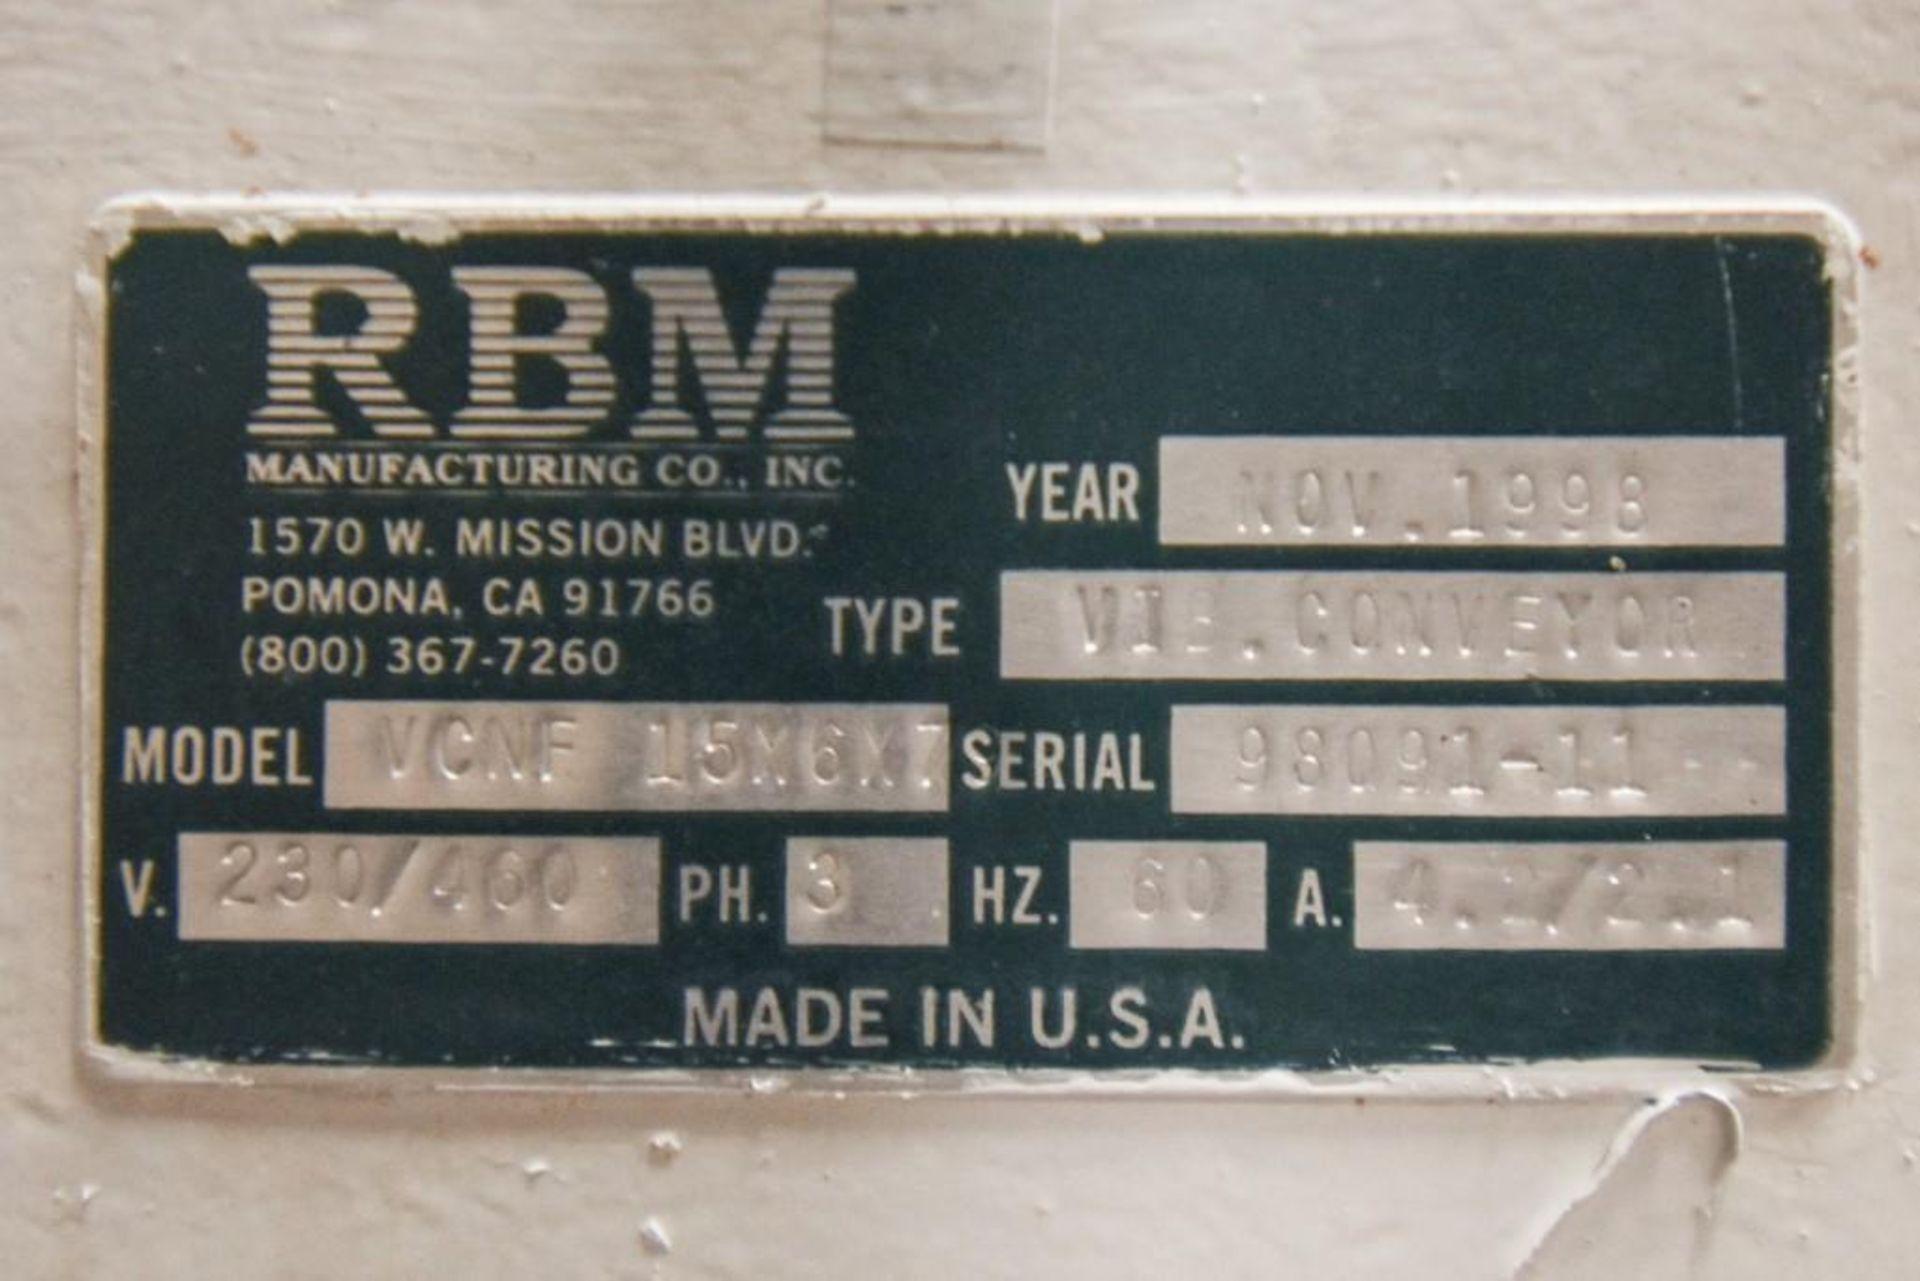 RBM Vibratory Deck VCNF-15X6X7 - Image 6 of 6